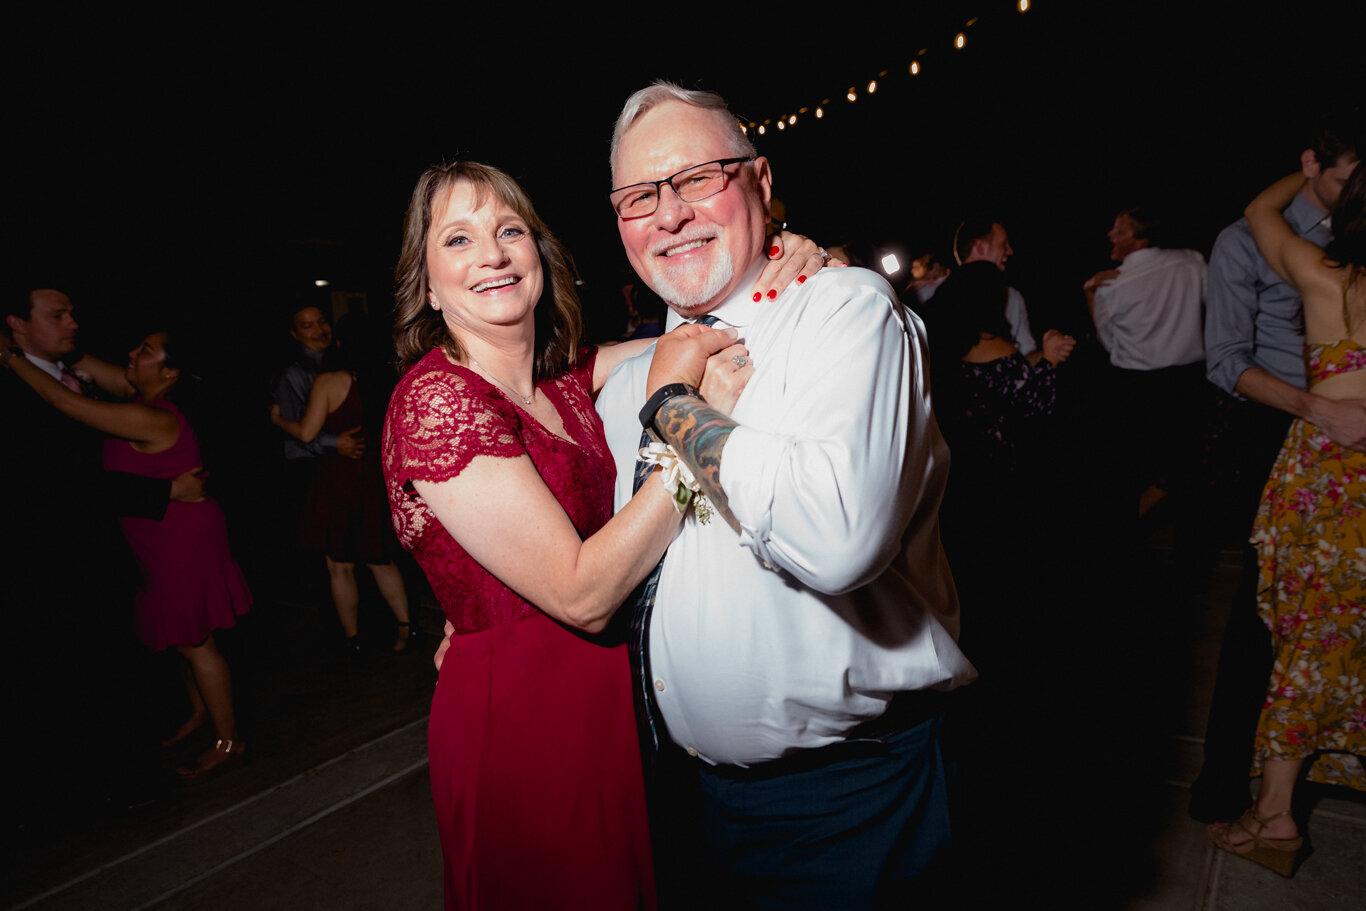 2019.08.24_Emily-Ashir-Wedding-at-the-Maples-6409.jpg